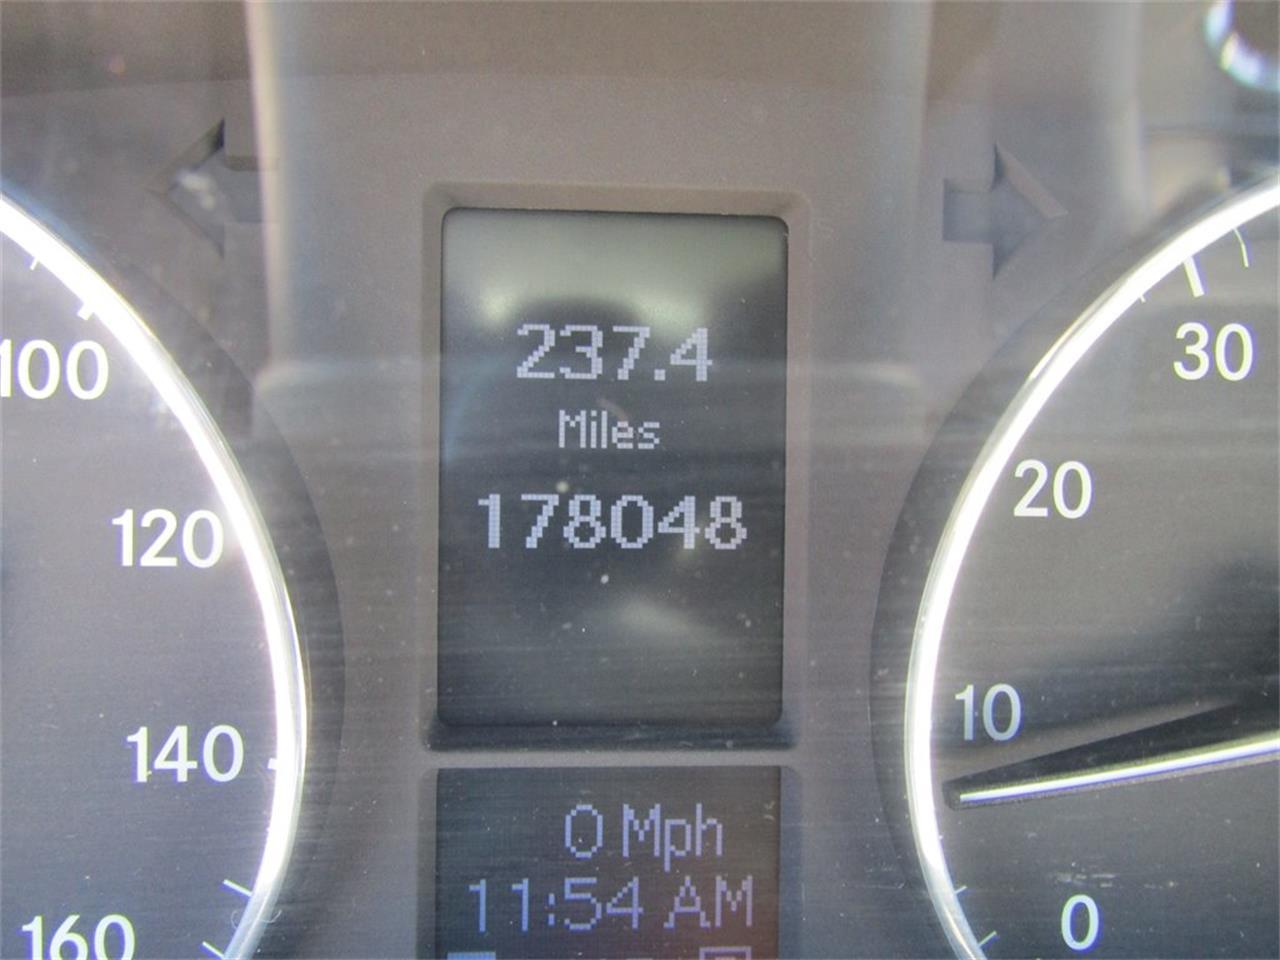 2005 Mercedes-Benz C-Class (CC-1296449) for sale in Orlando, Florida